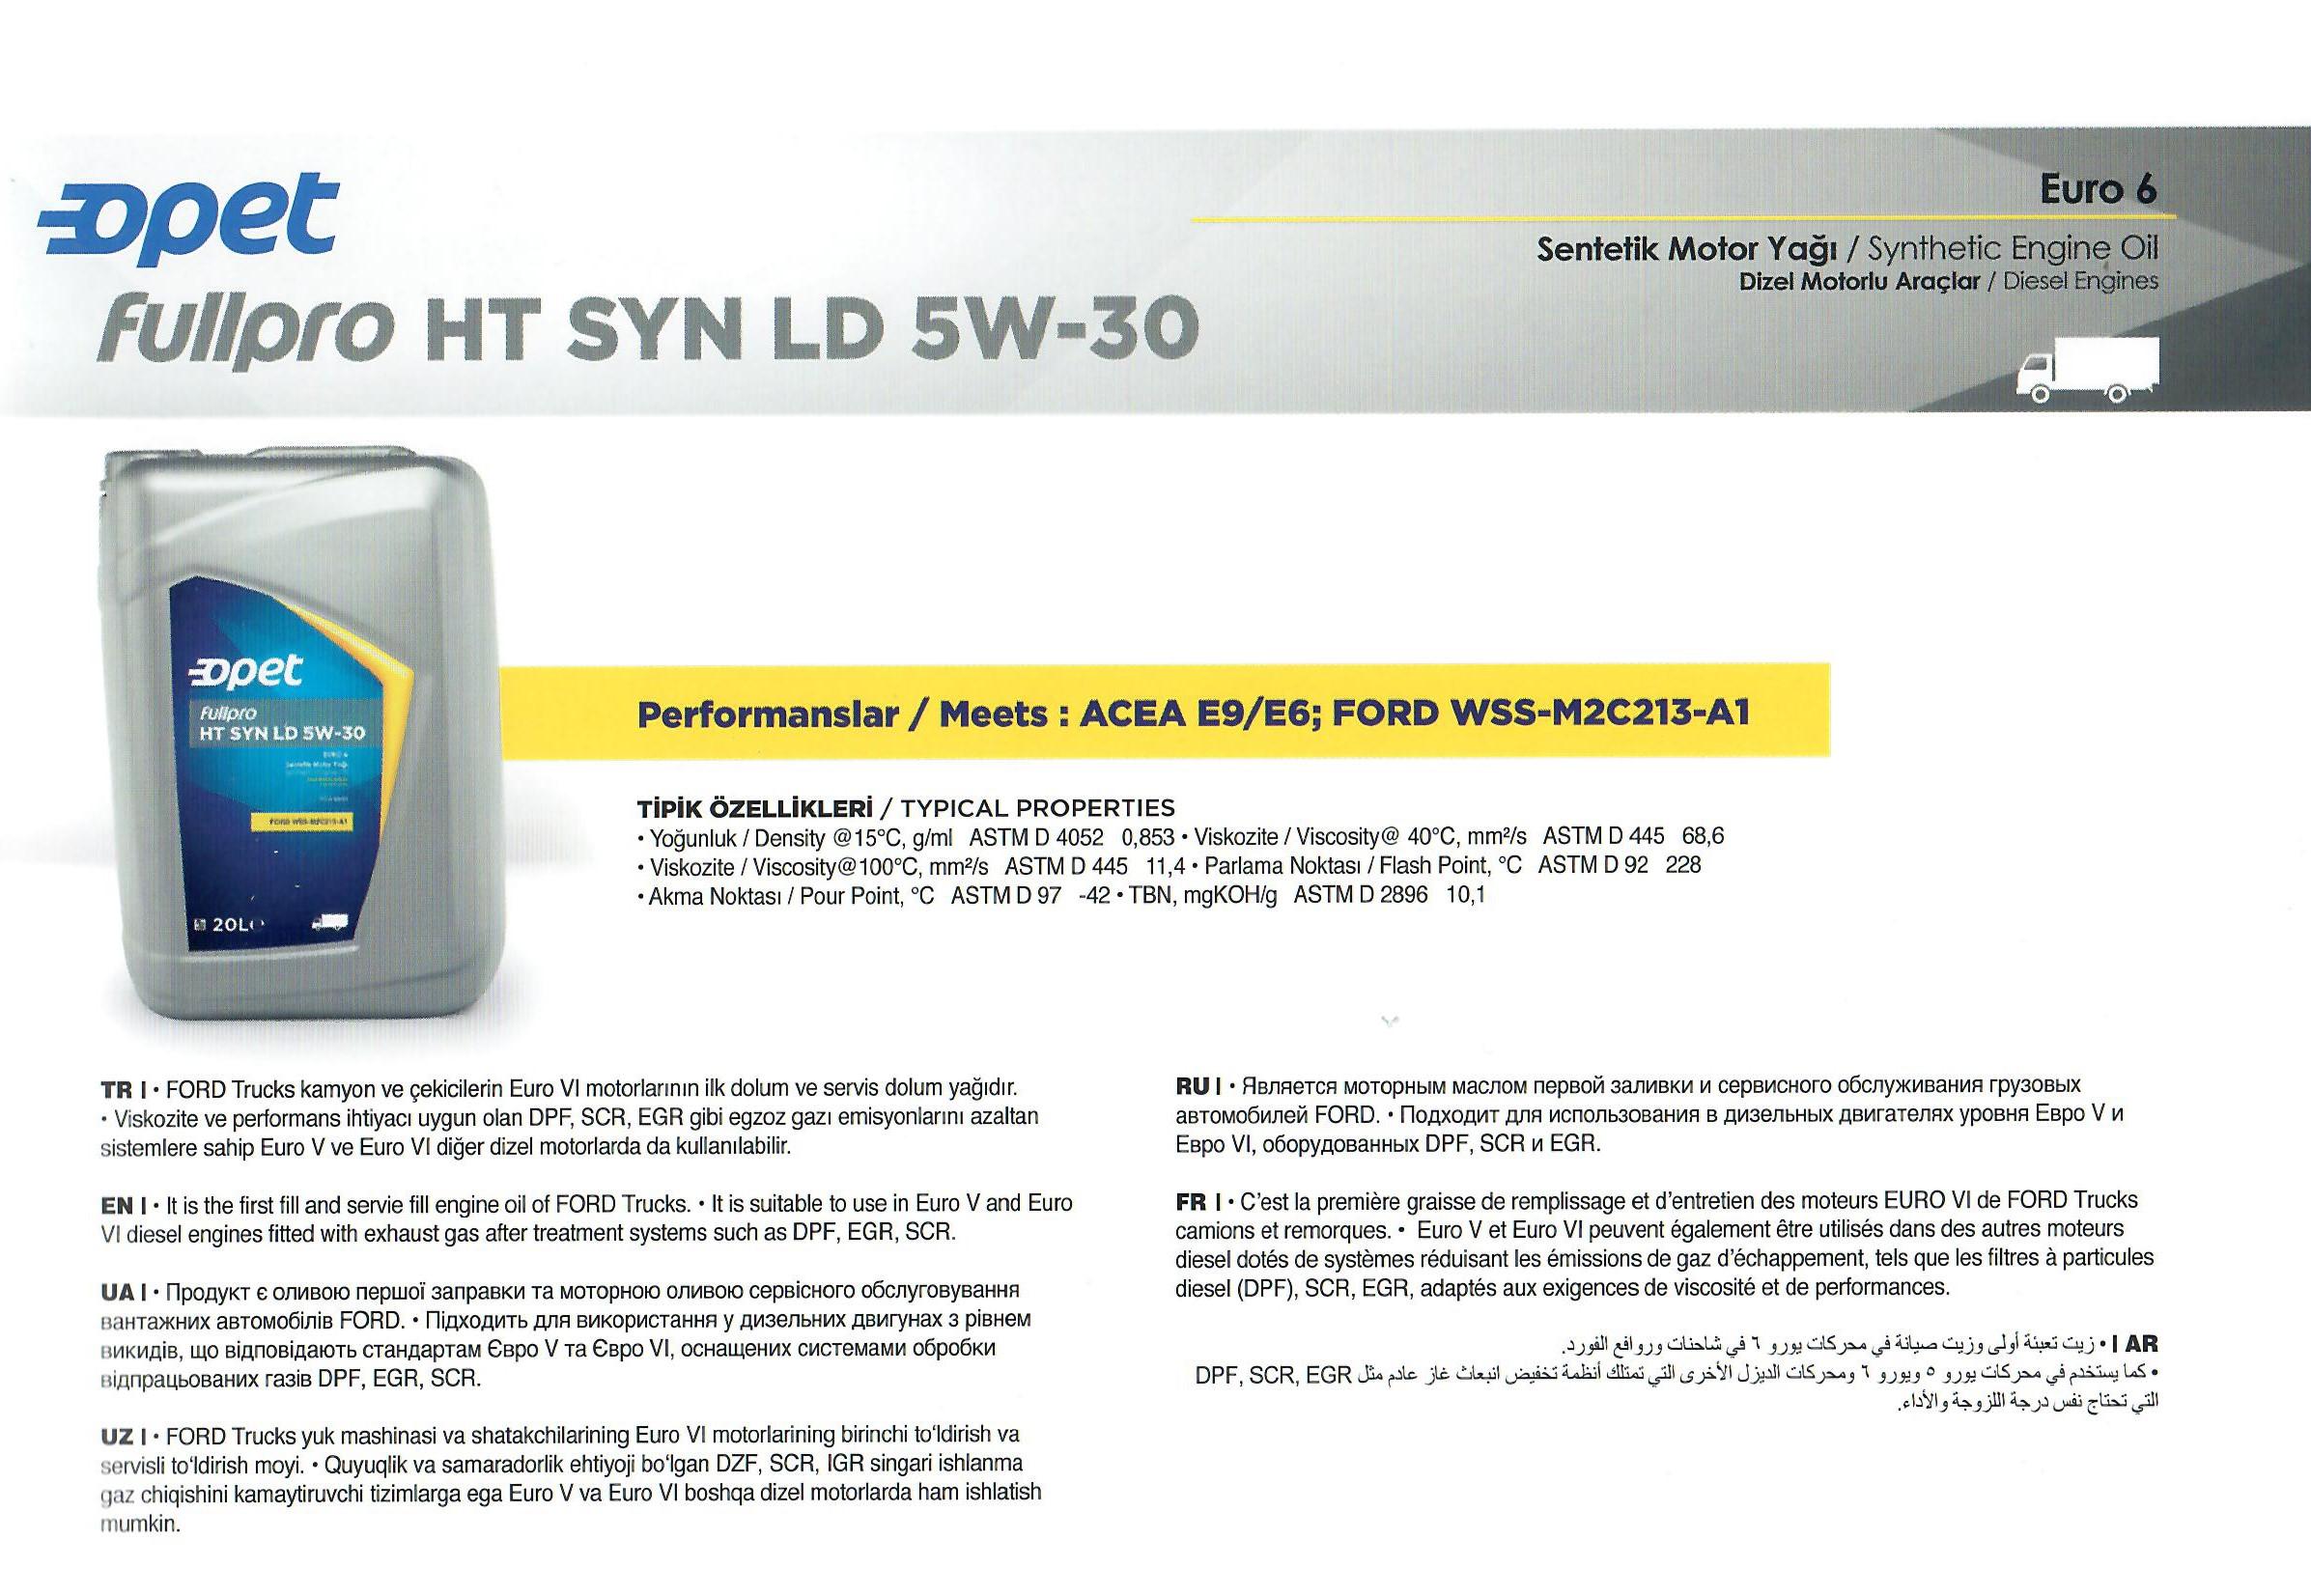 FULLPRO HT SYN LD 5W-30